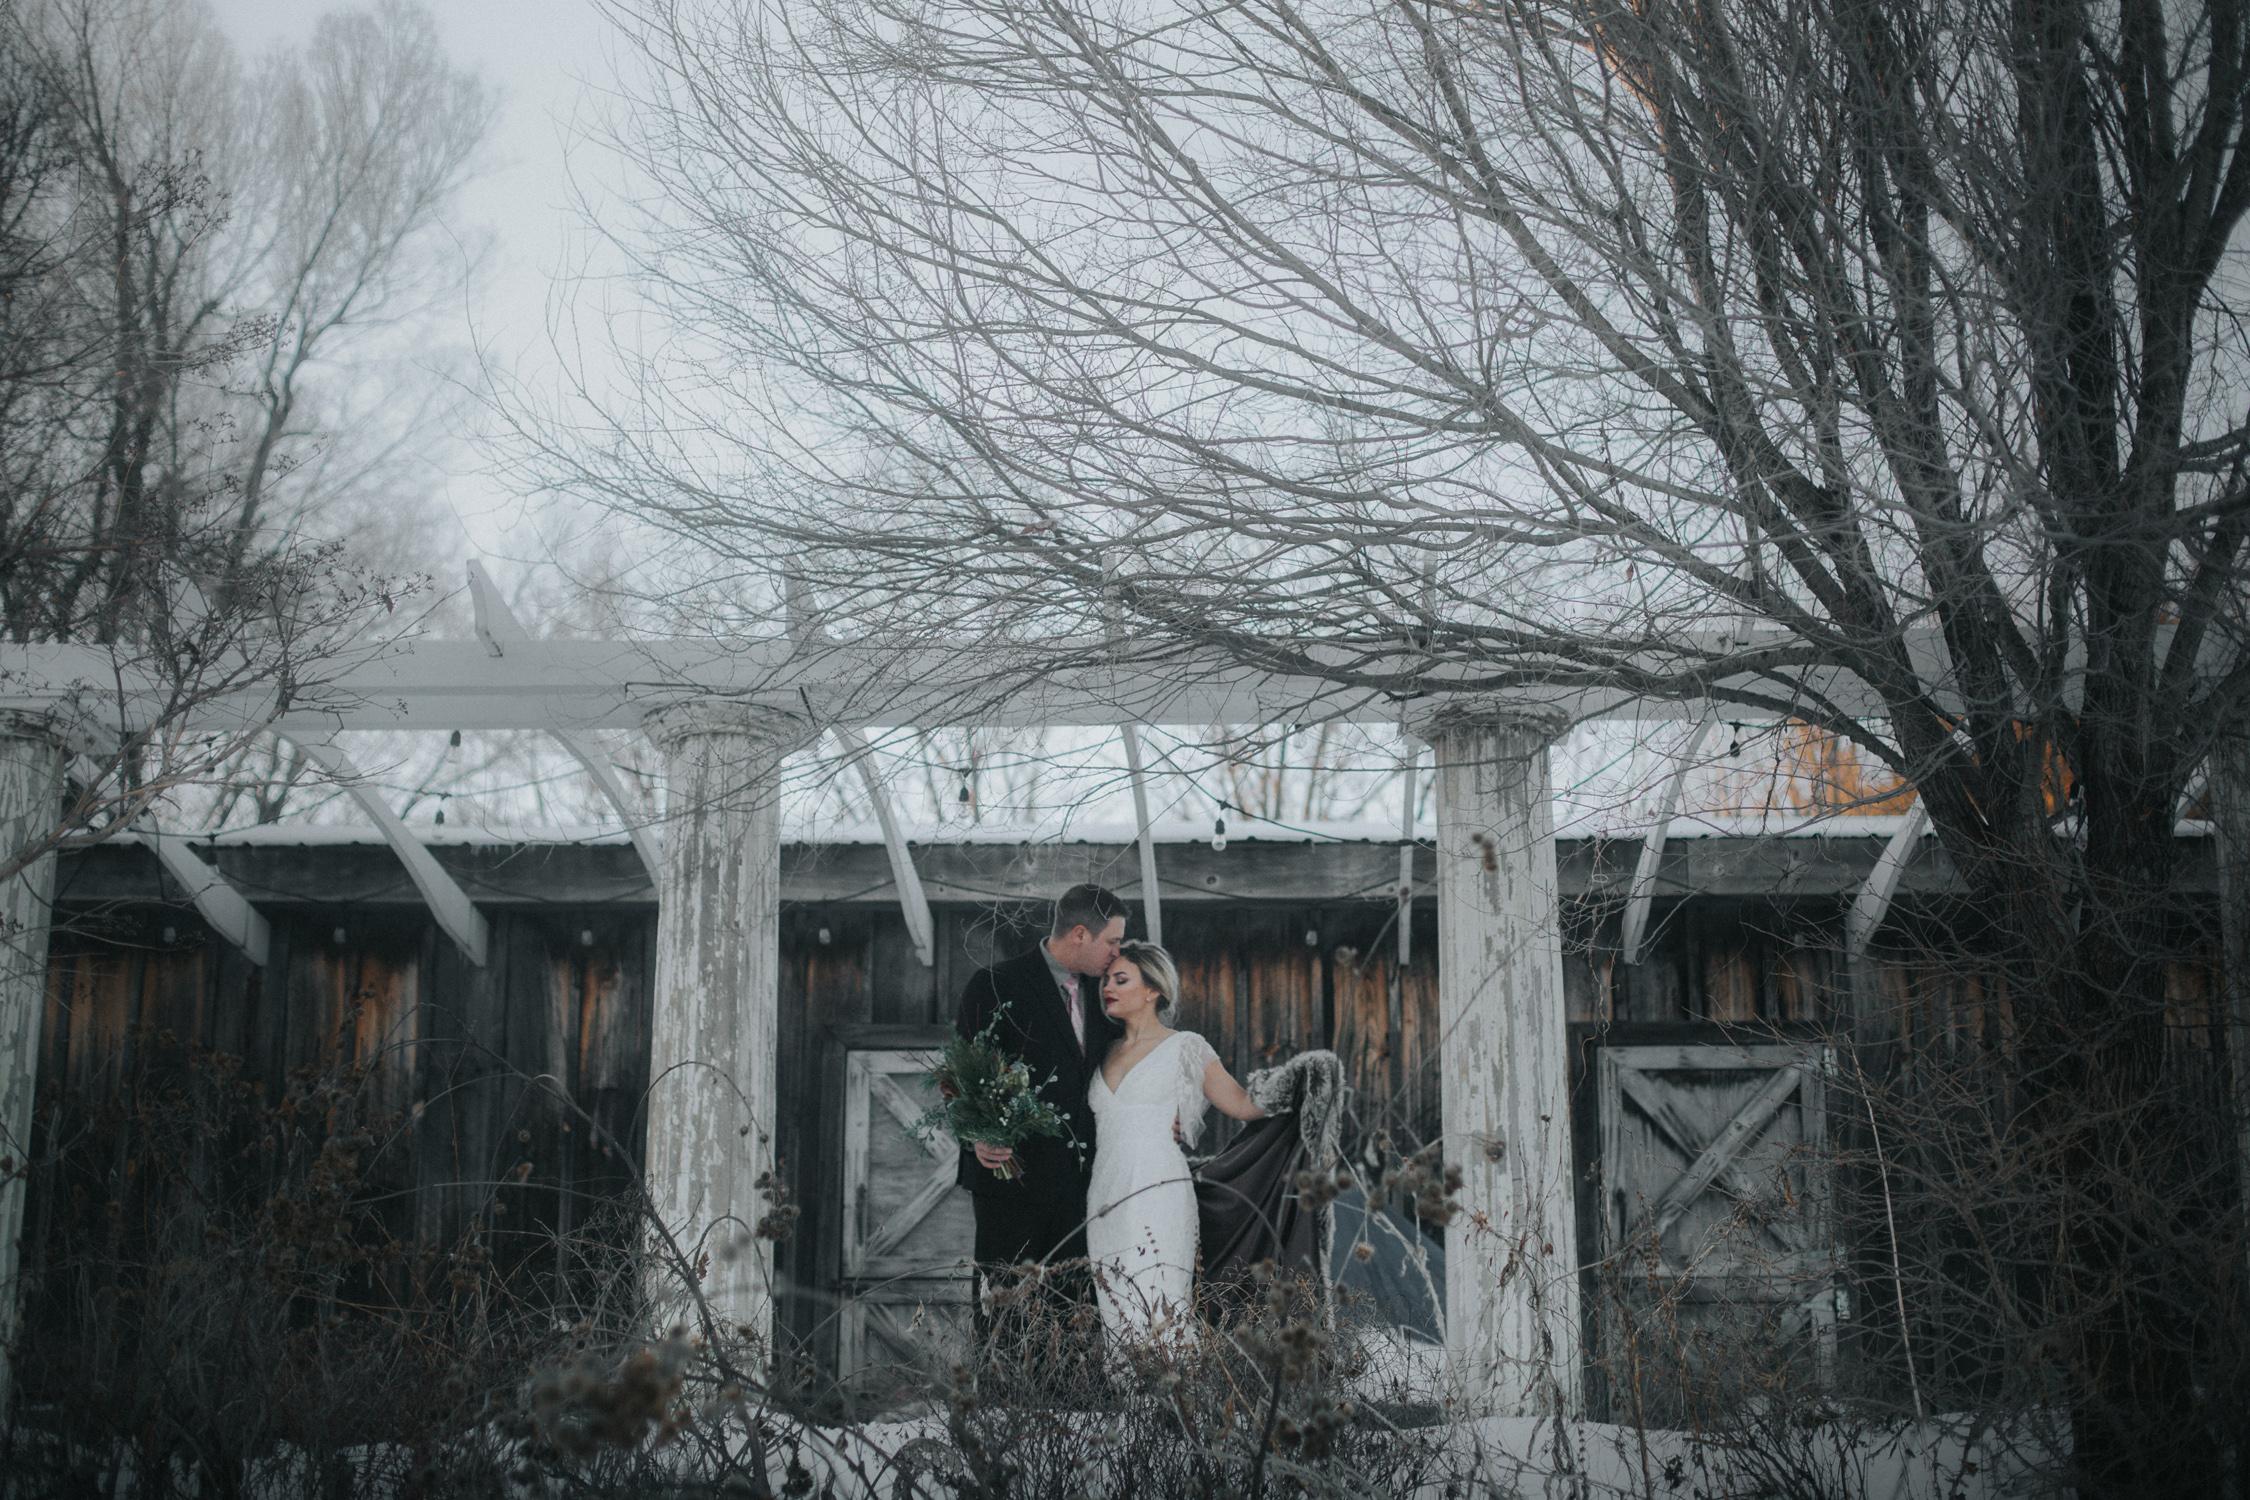 mnd_farm_winter_wedding_026.jpg